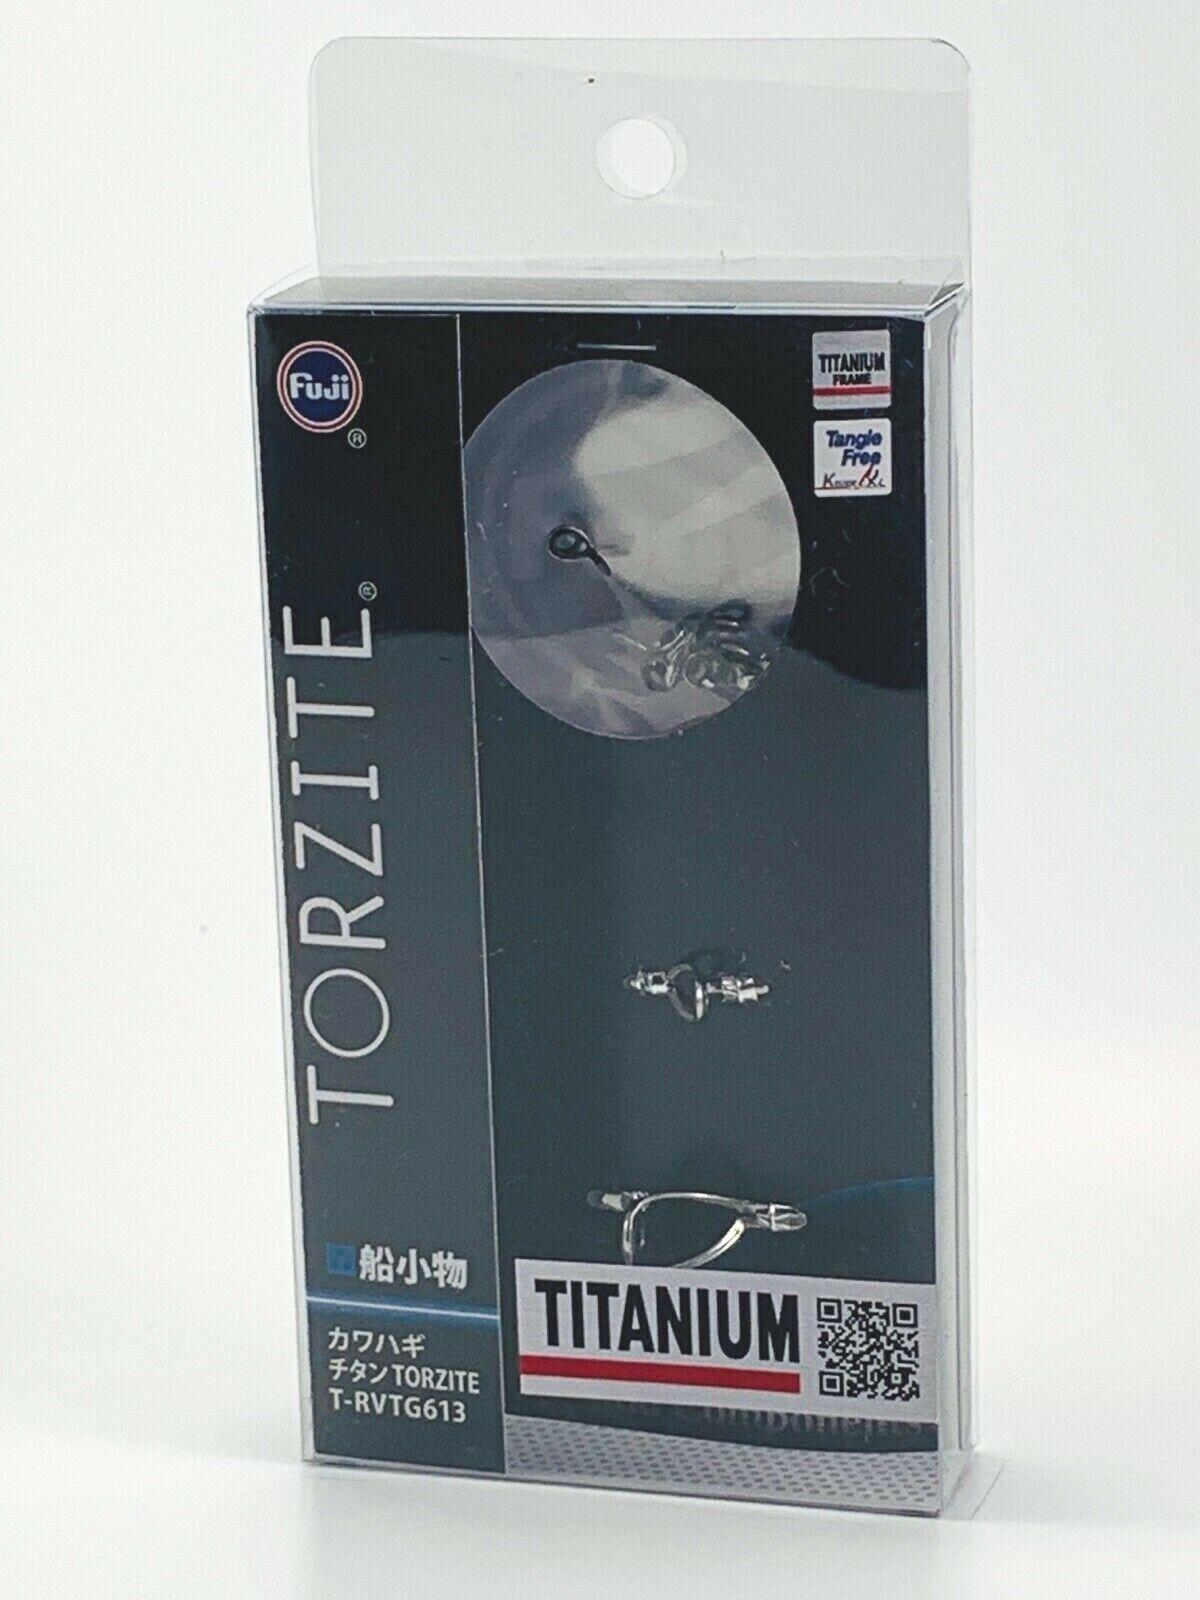 Fuji original Titanium TORZITE Bait Finesse Guide Set T-RVTG 613 Libre SHIPPING